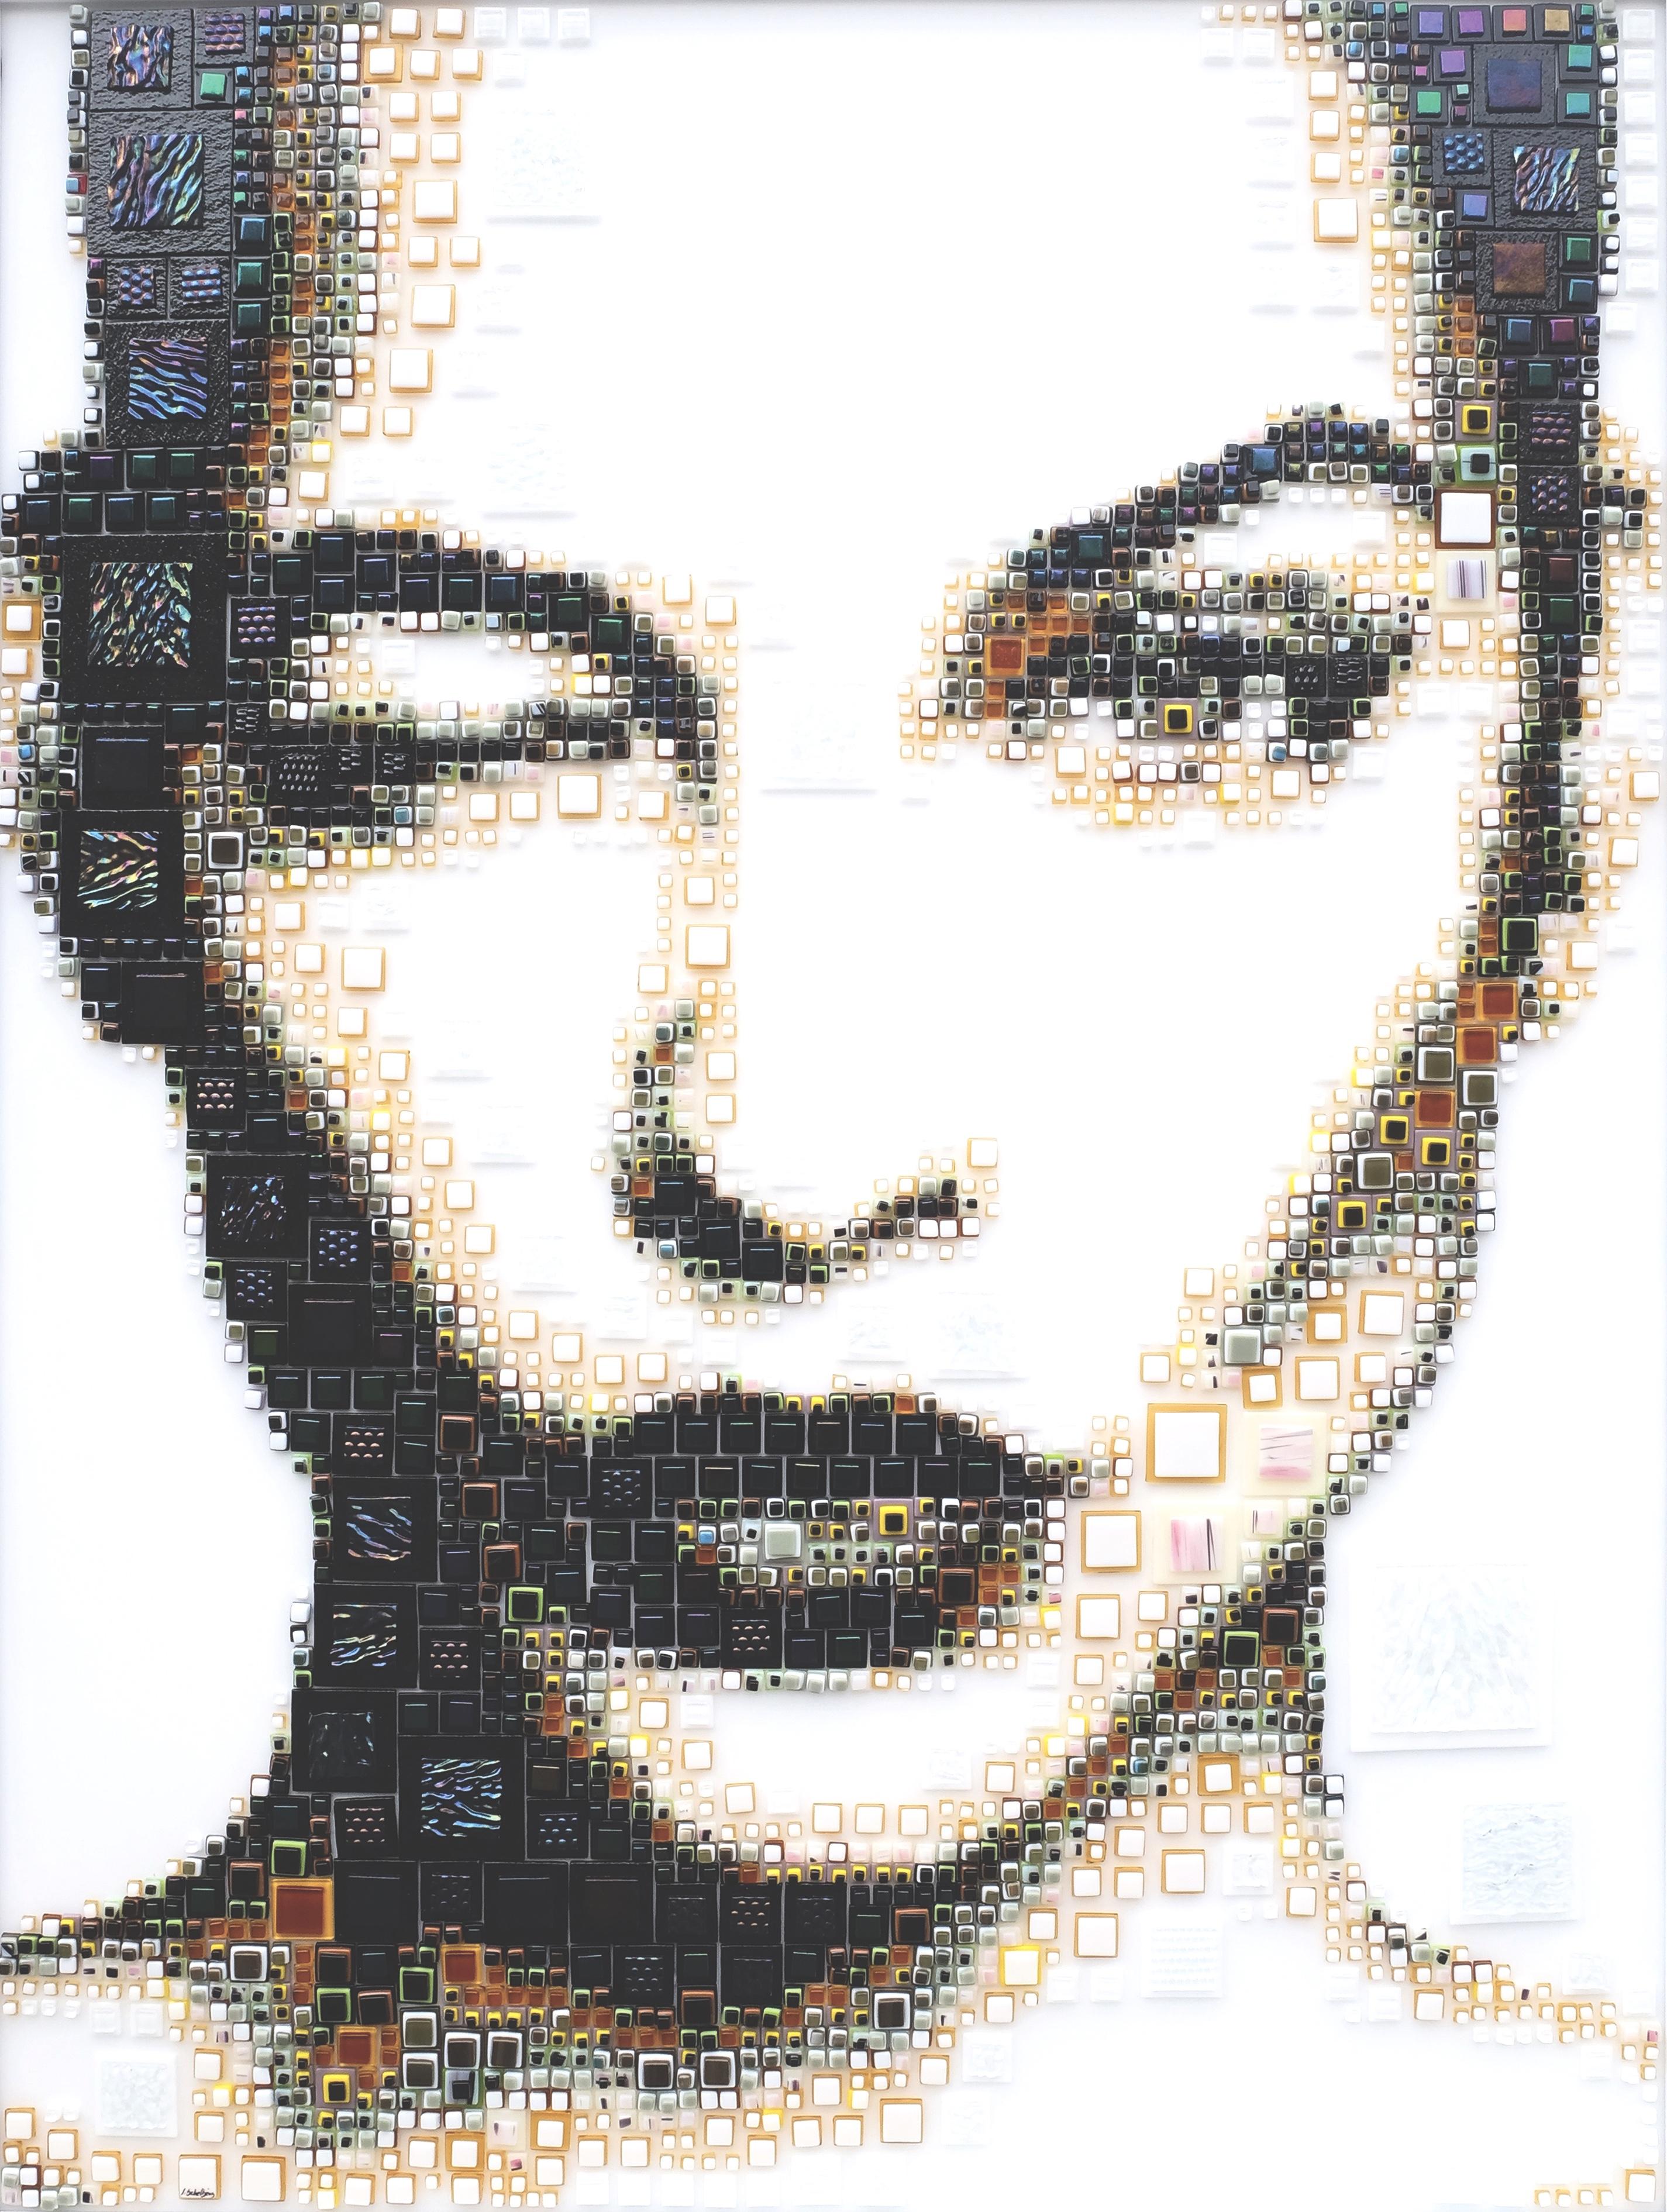 General 2850x3782 women artwork Isabelle Scheltjens mosaic face portrait display square glass 3D white background black lipstick portrait wink winking